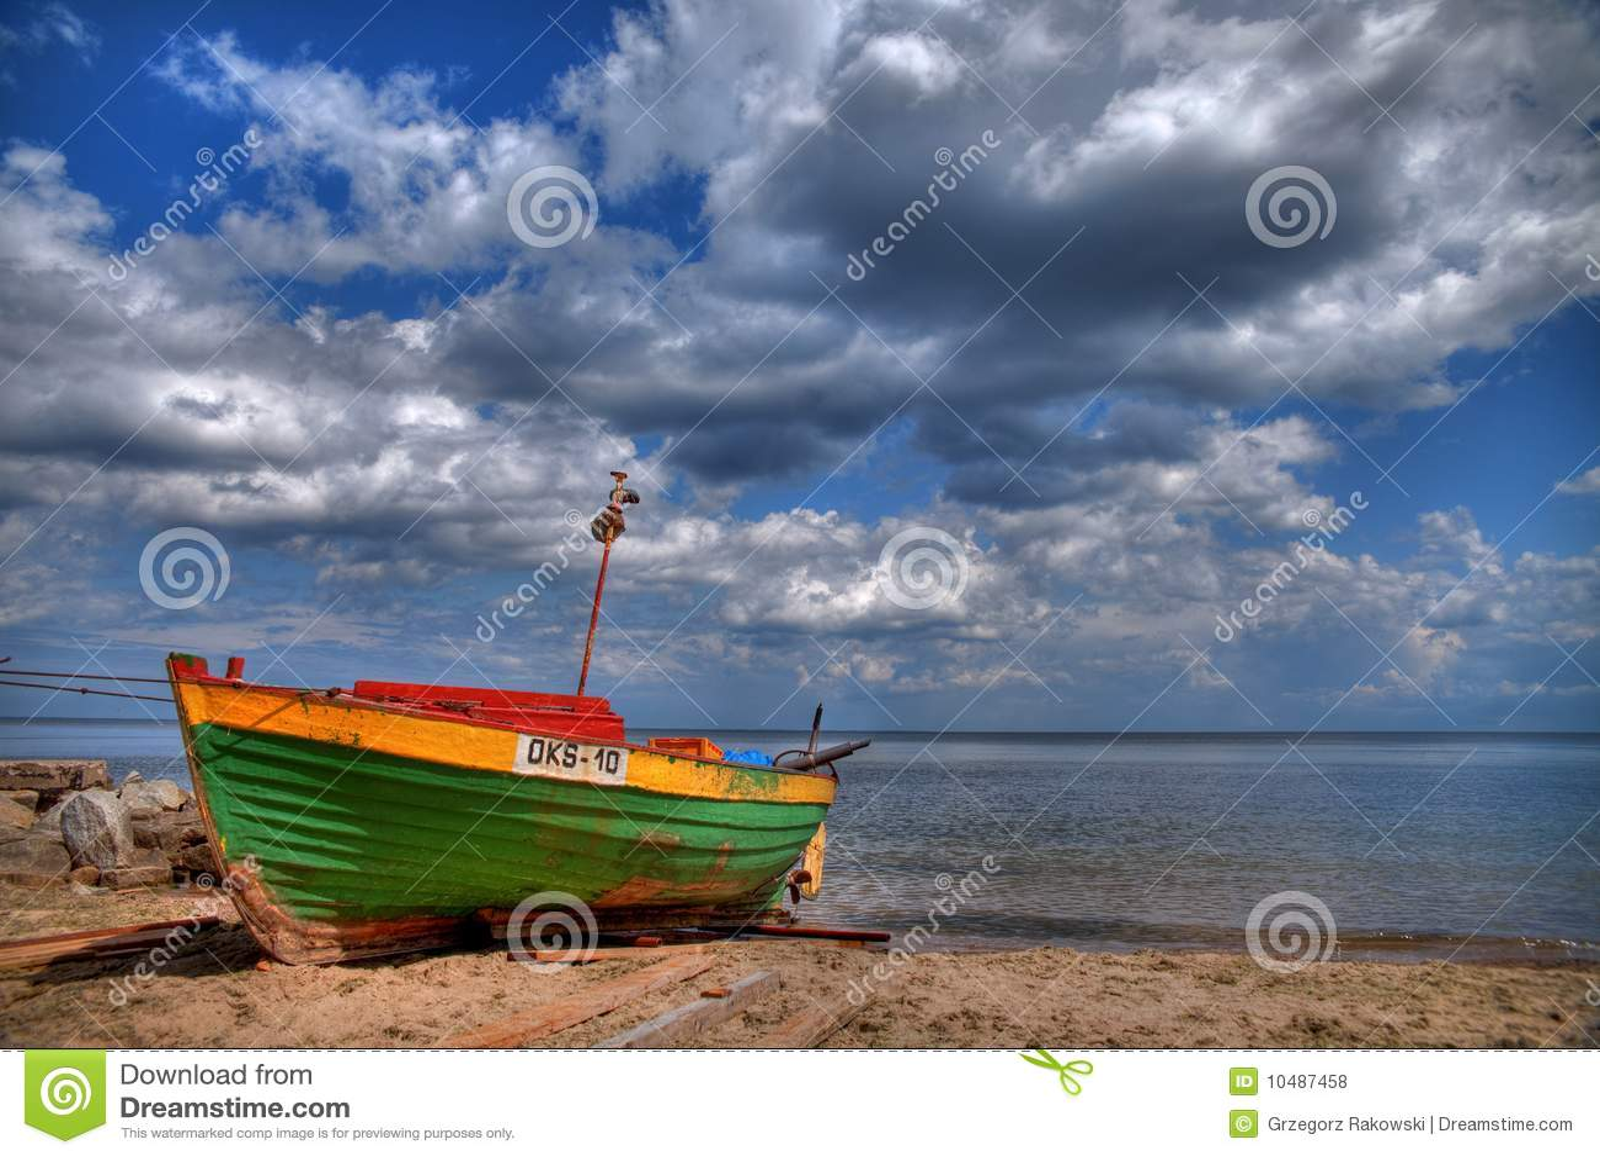 Fishing boat royalty free stock photos image 10487458 for Free fishing boats